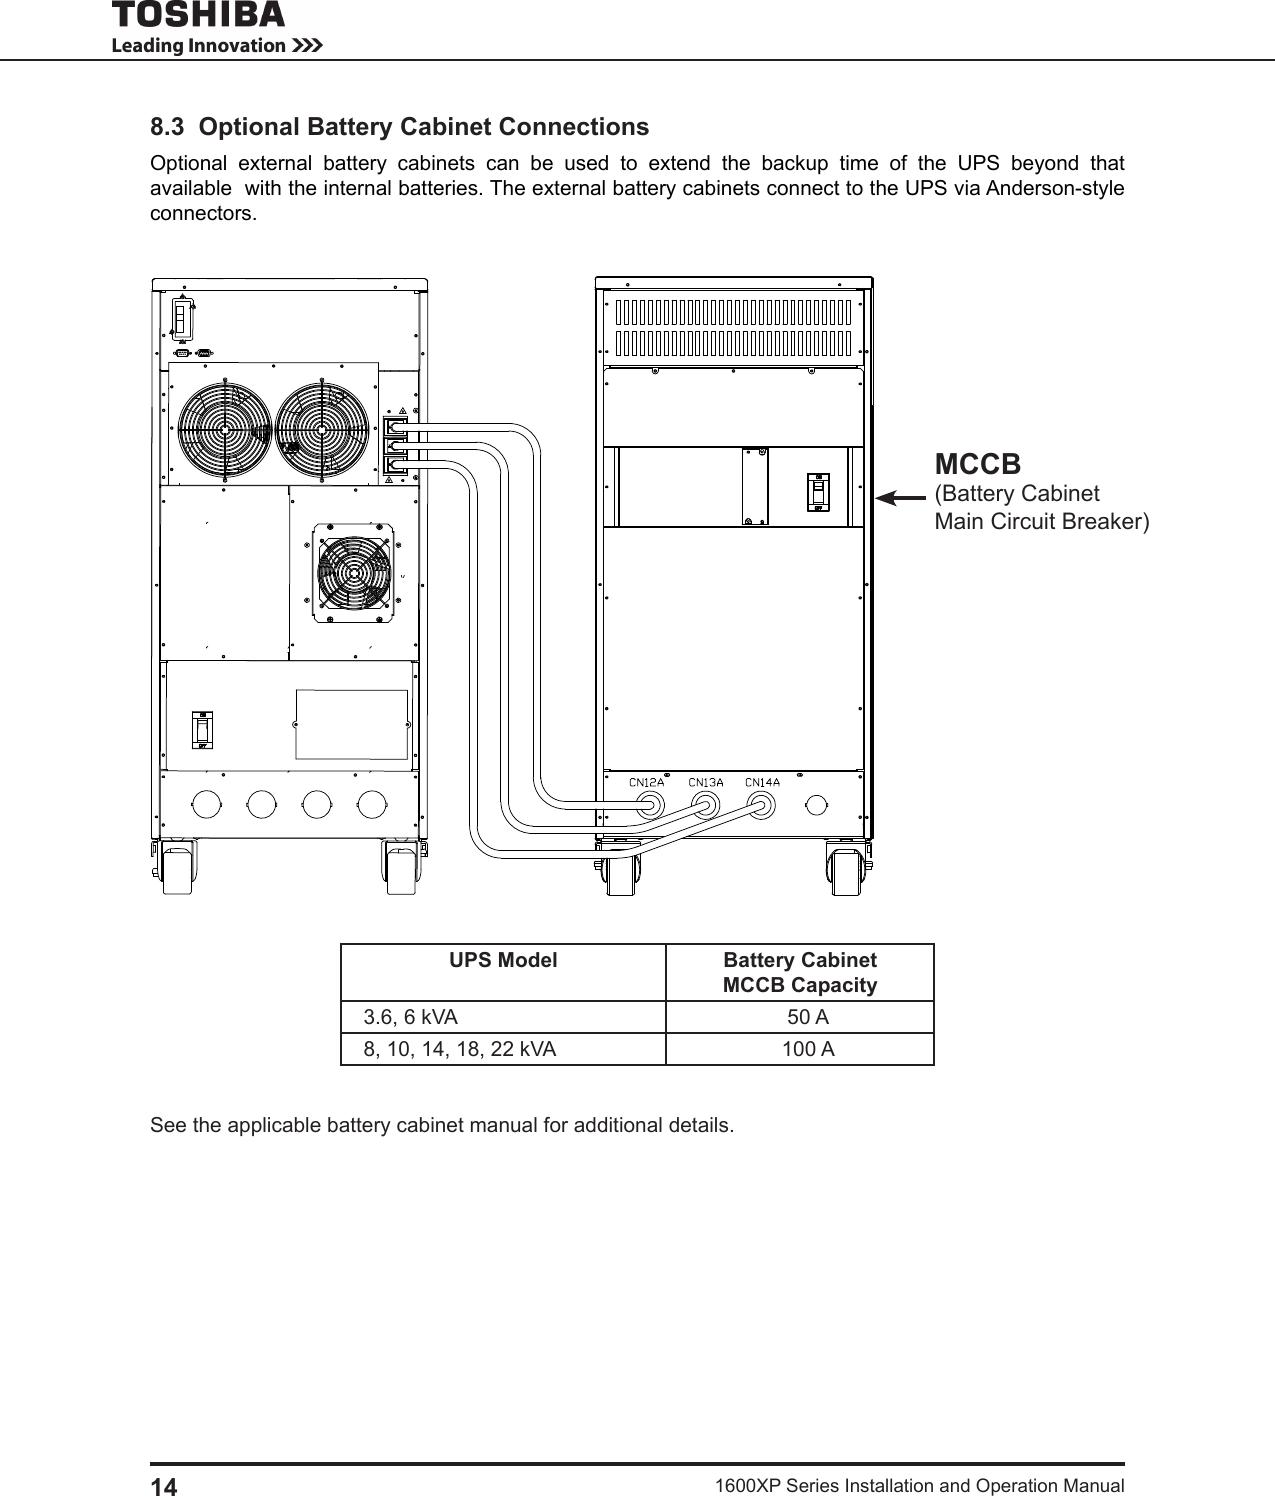 2002 Pt Cruiser Pin 85 Wiring Diagram   Wiring Liry Wagner Headlight Wiring Diagram For on